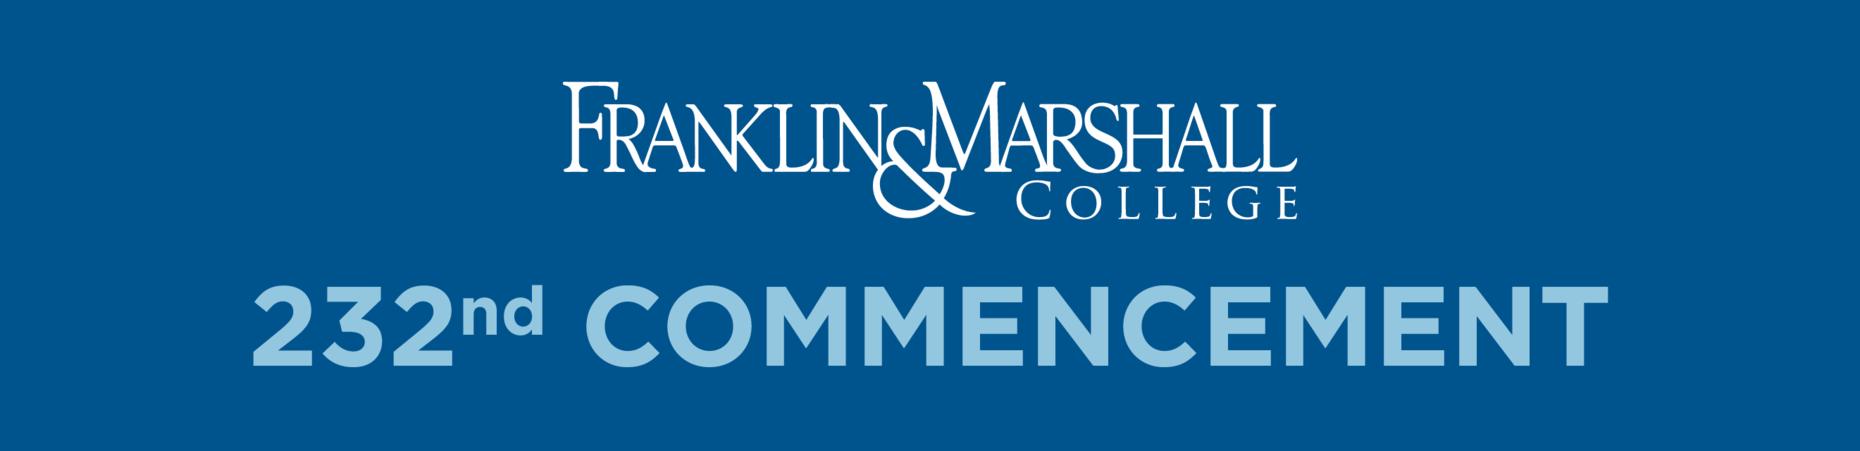 Franklin & Marshall - Commencement 2019 F&m Academic Calendar 2019